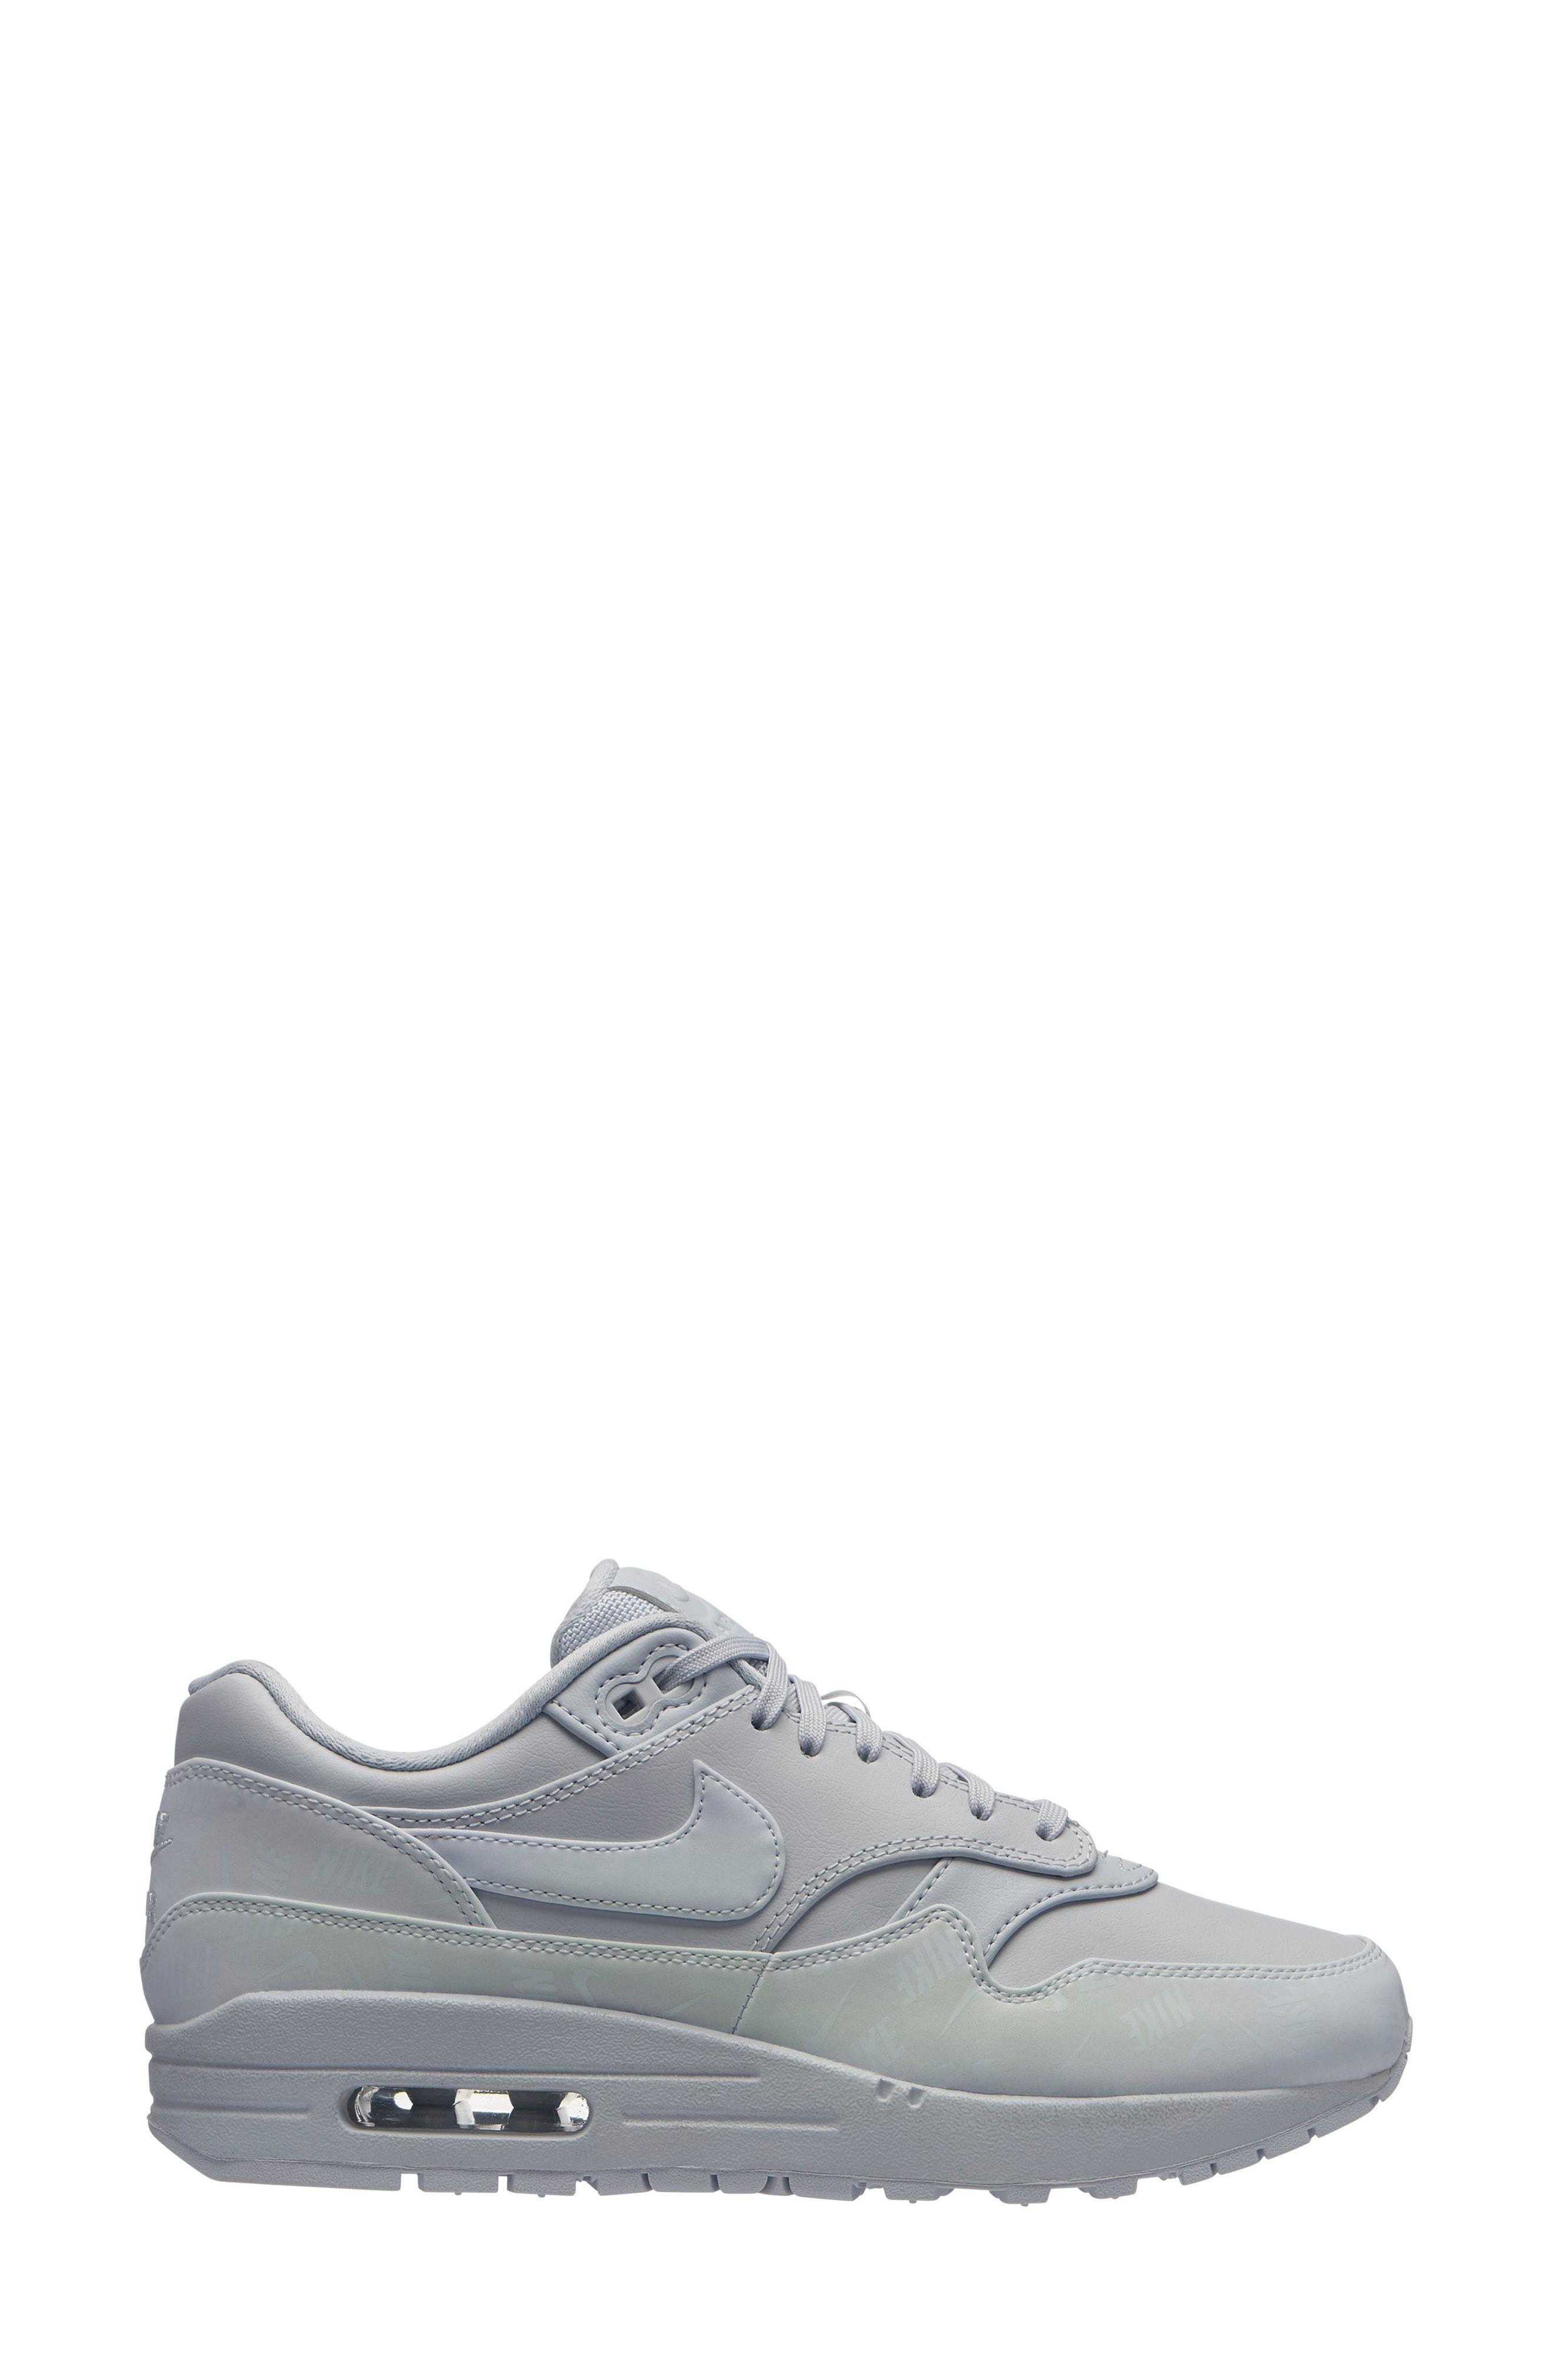 Nike. Women s Air Max 1 Lux Sneaker 682f98dbe